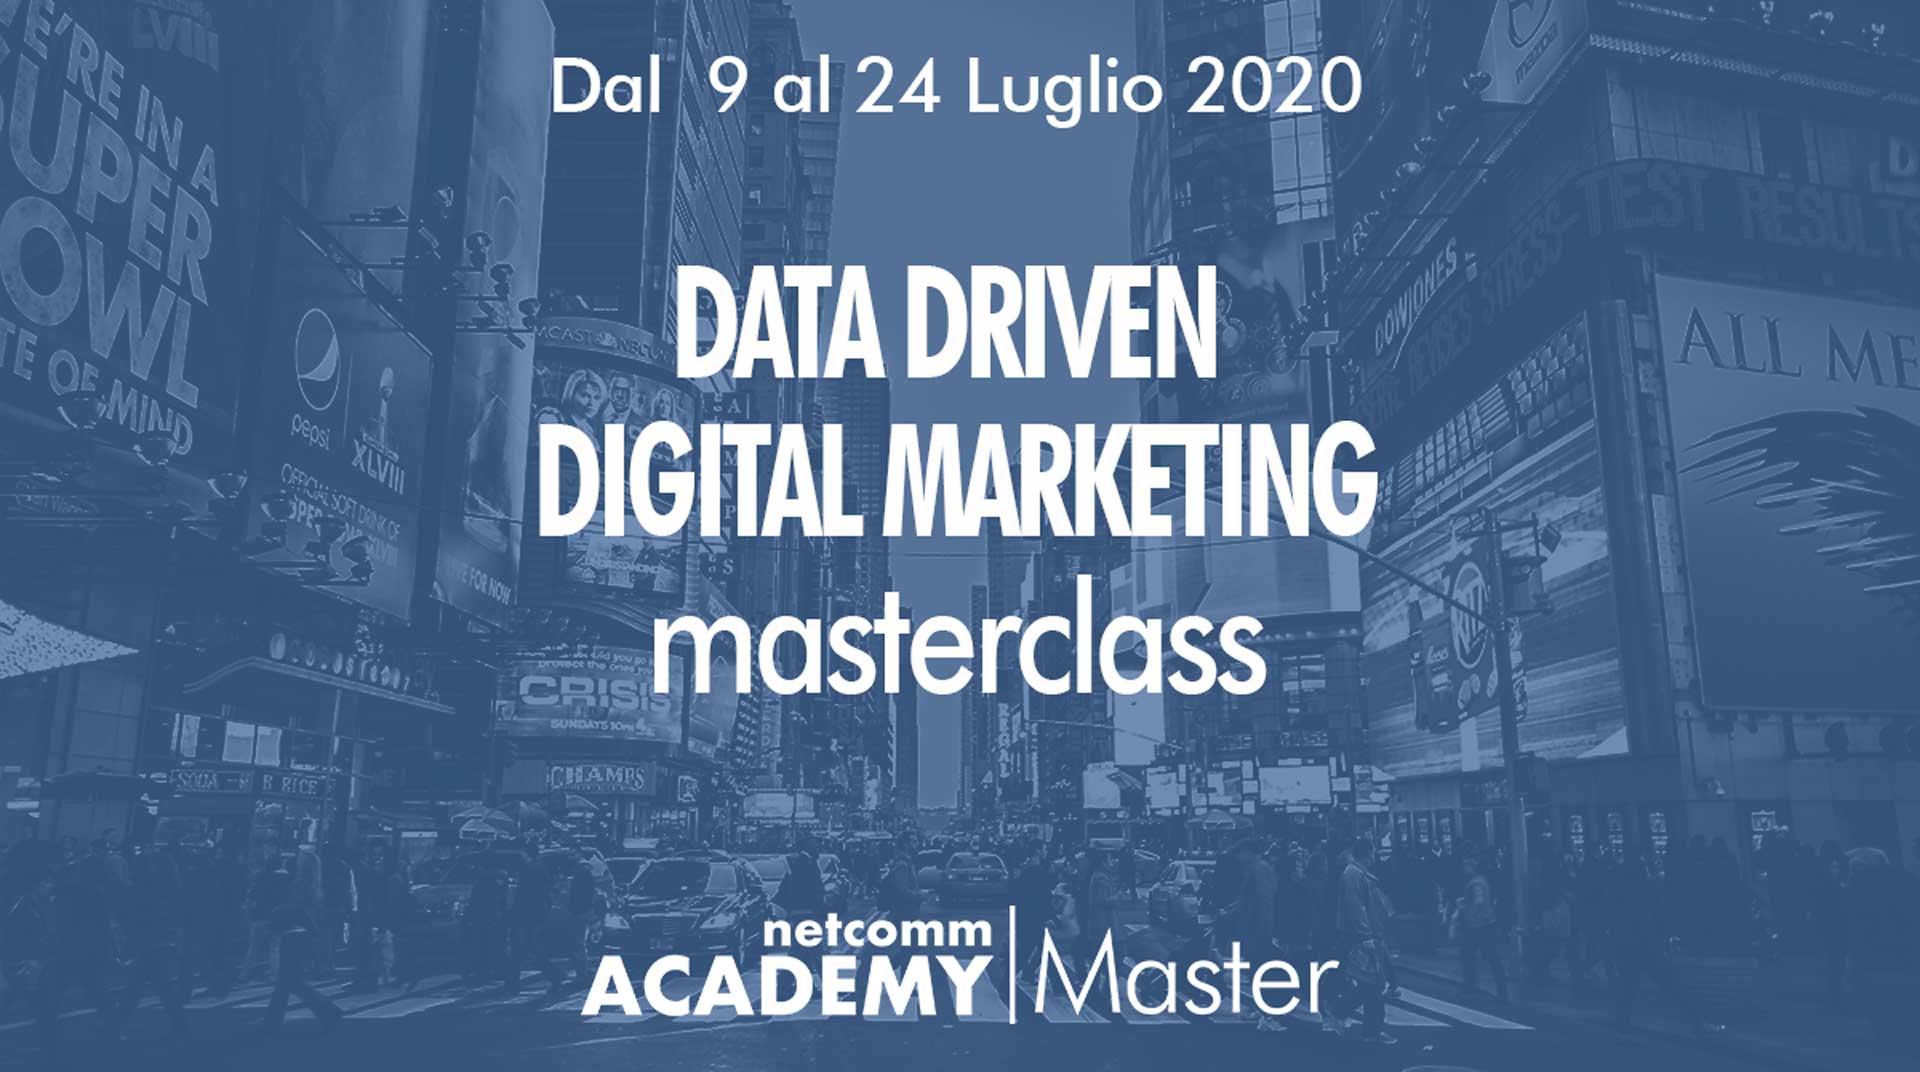 data driven digital marketing masterclass netcomm 2020 4 edizione